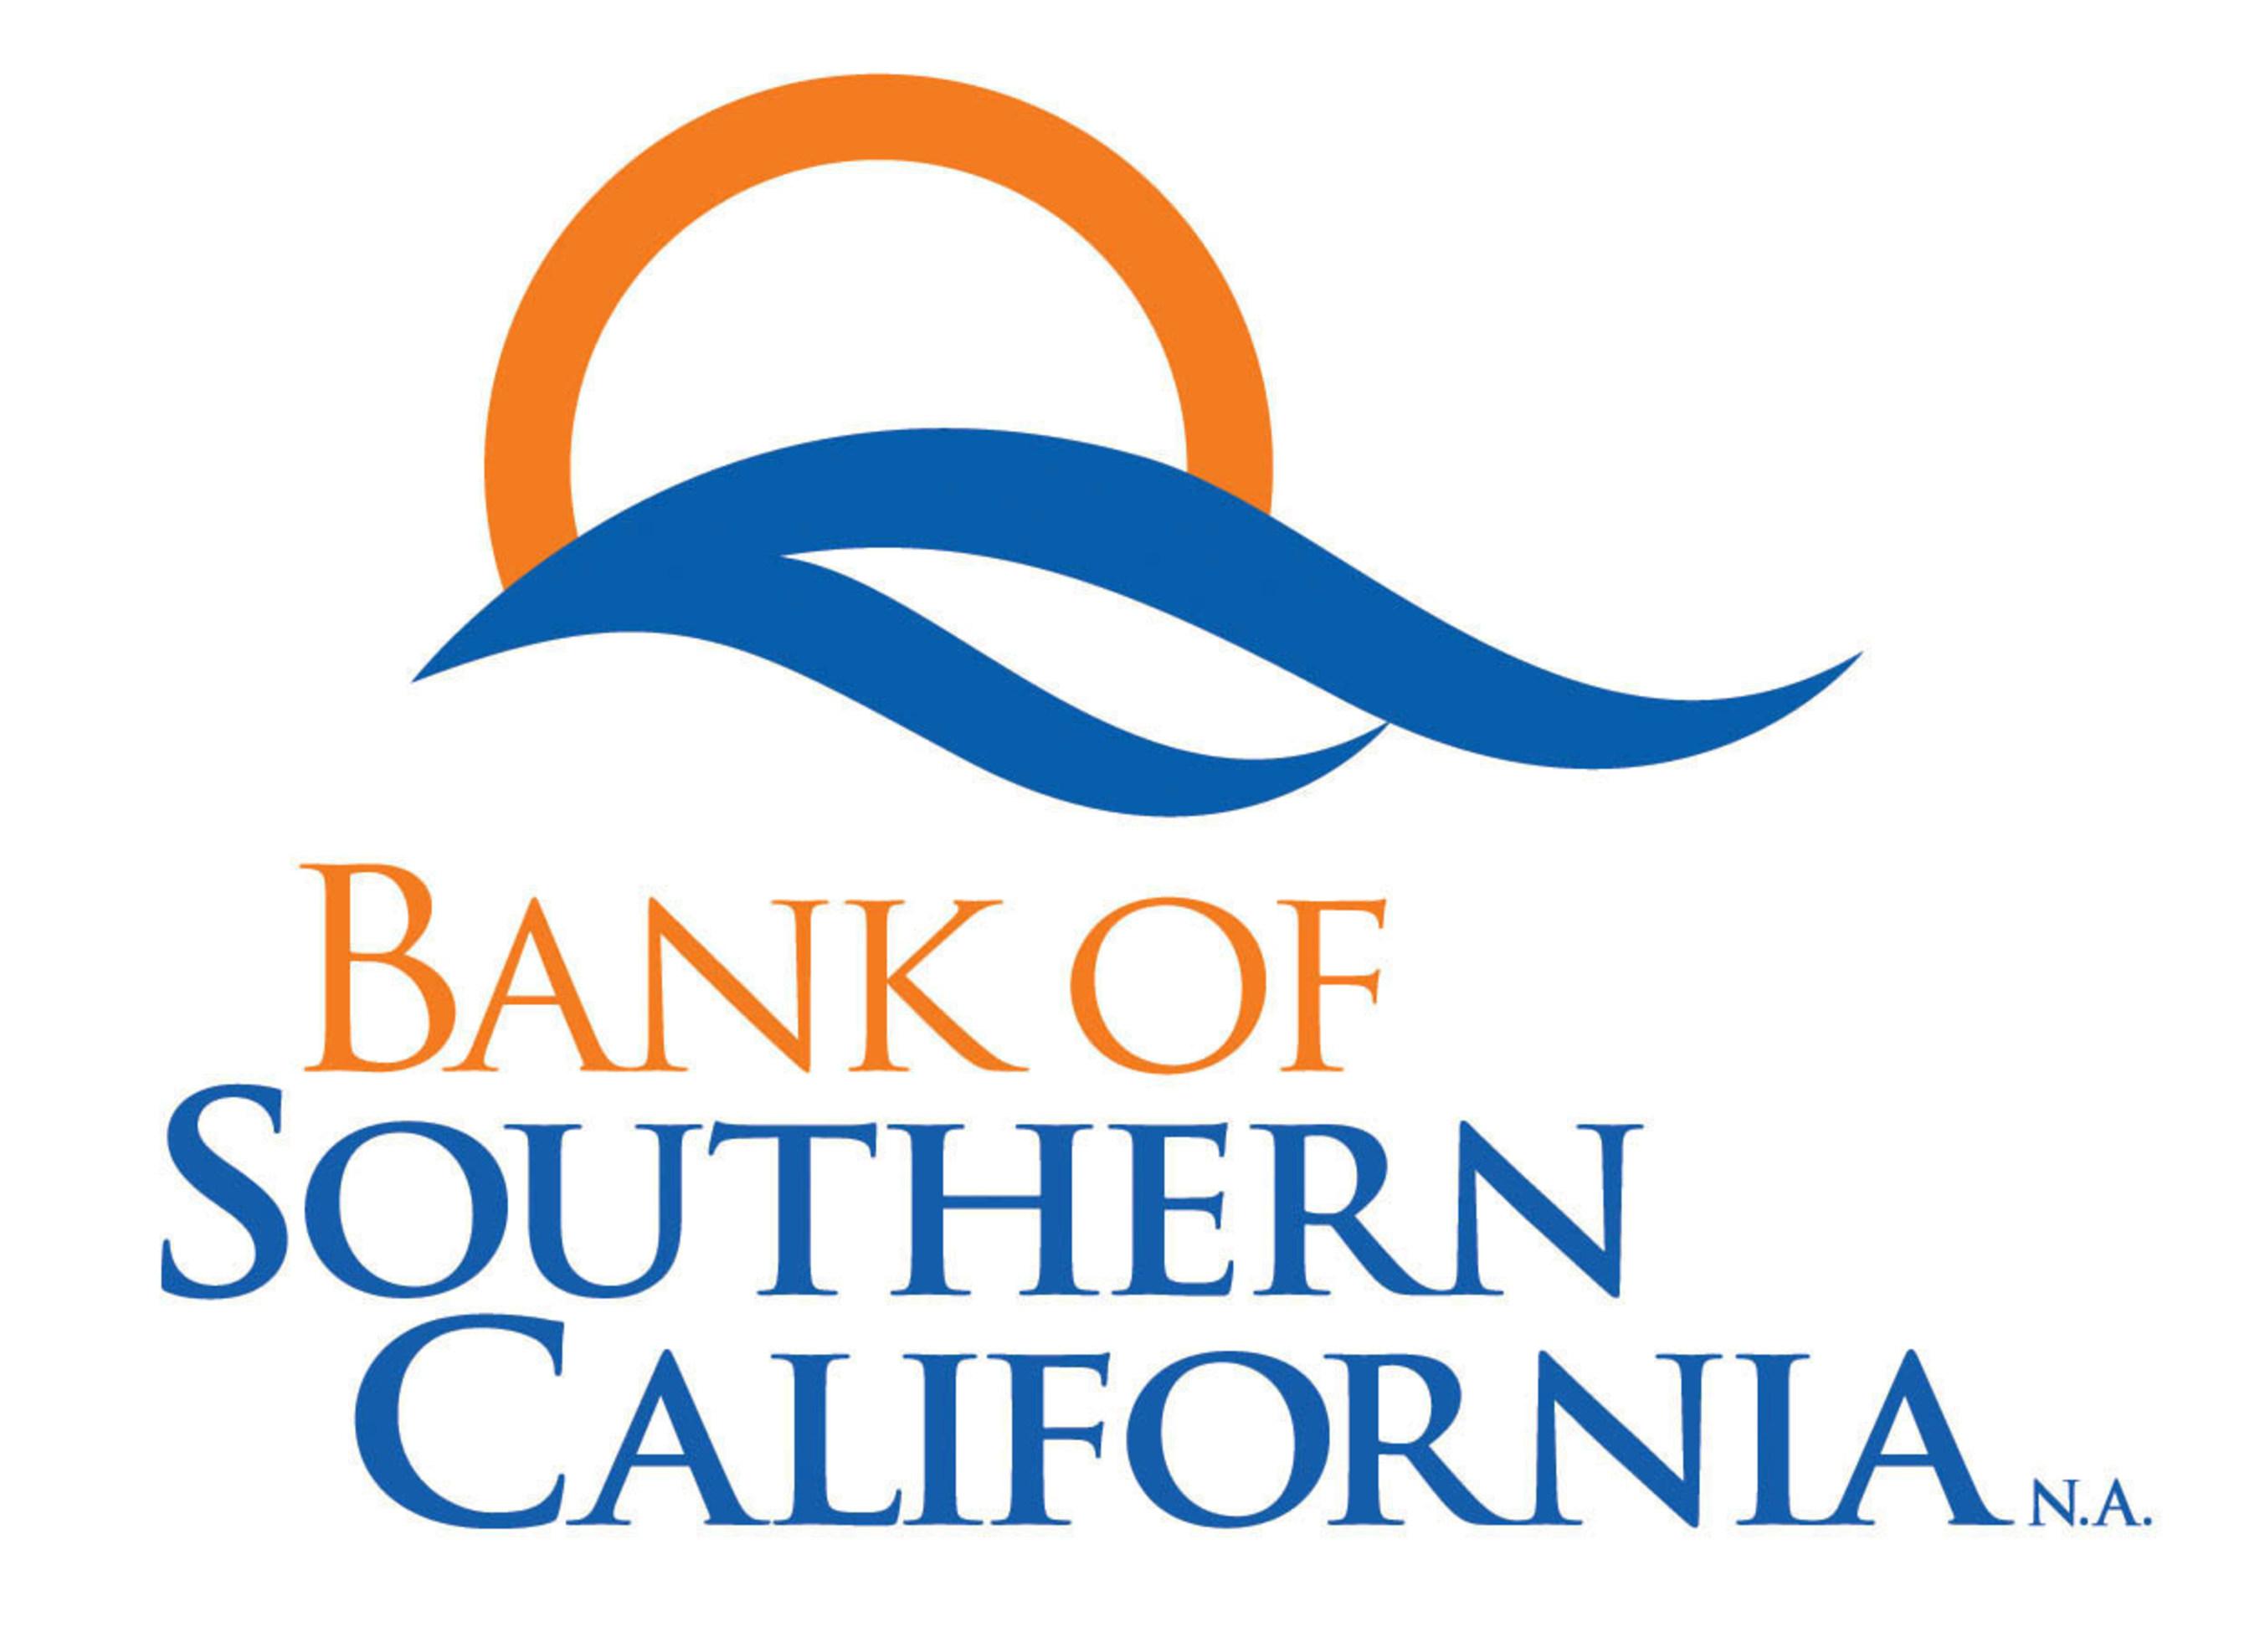 Bank of Southern California N.A. logo